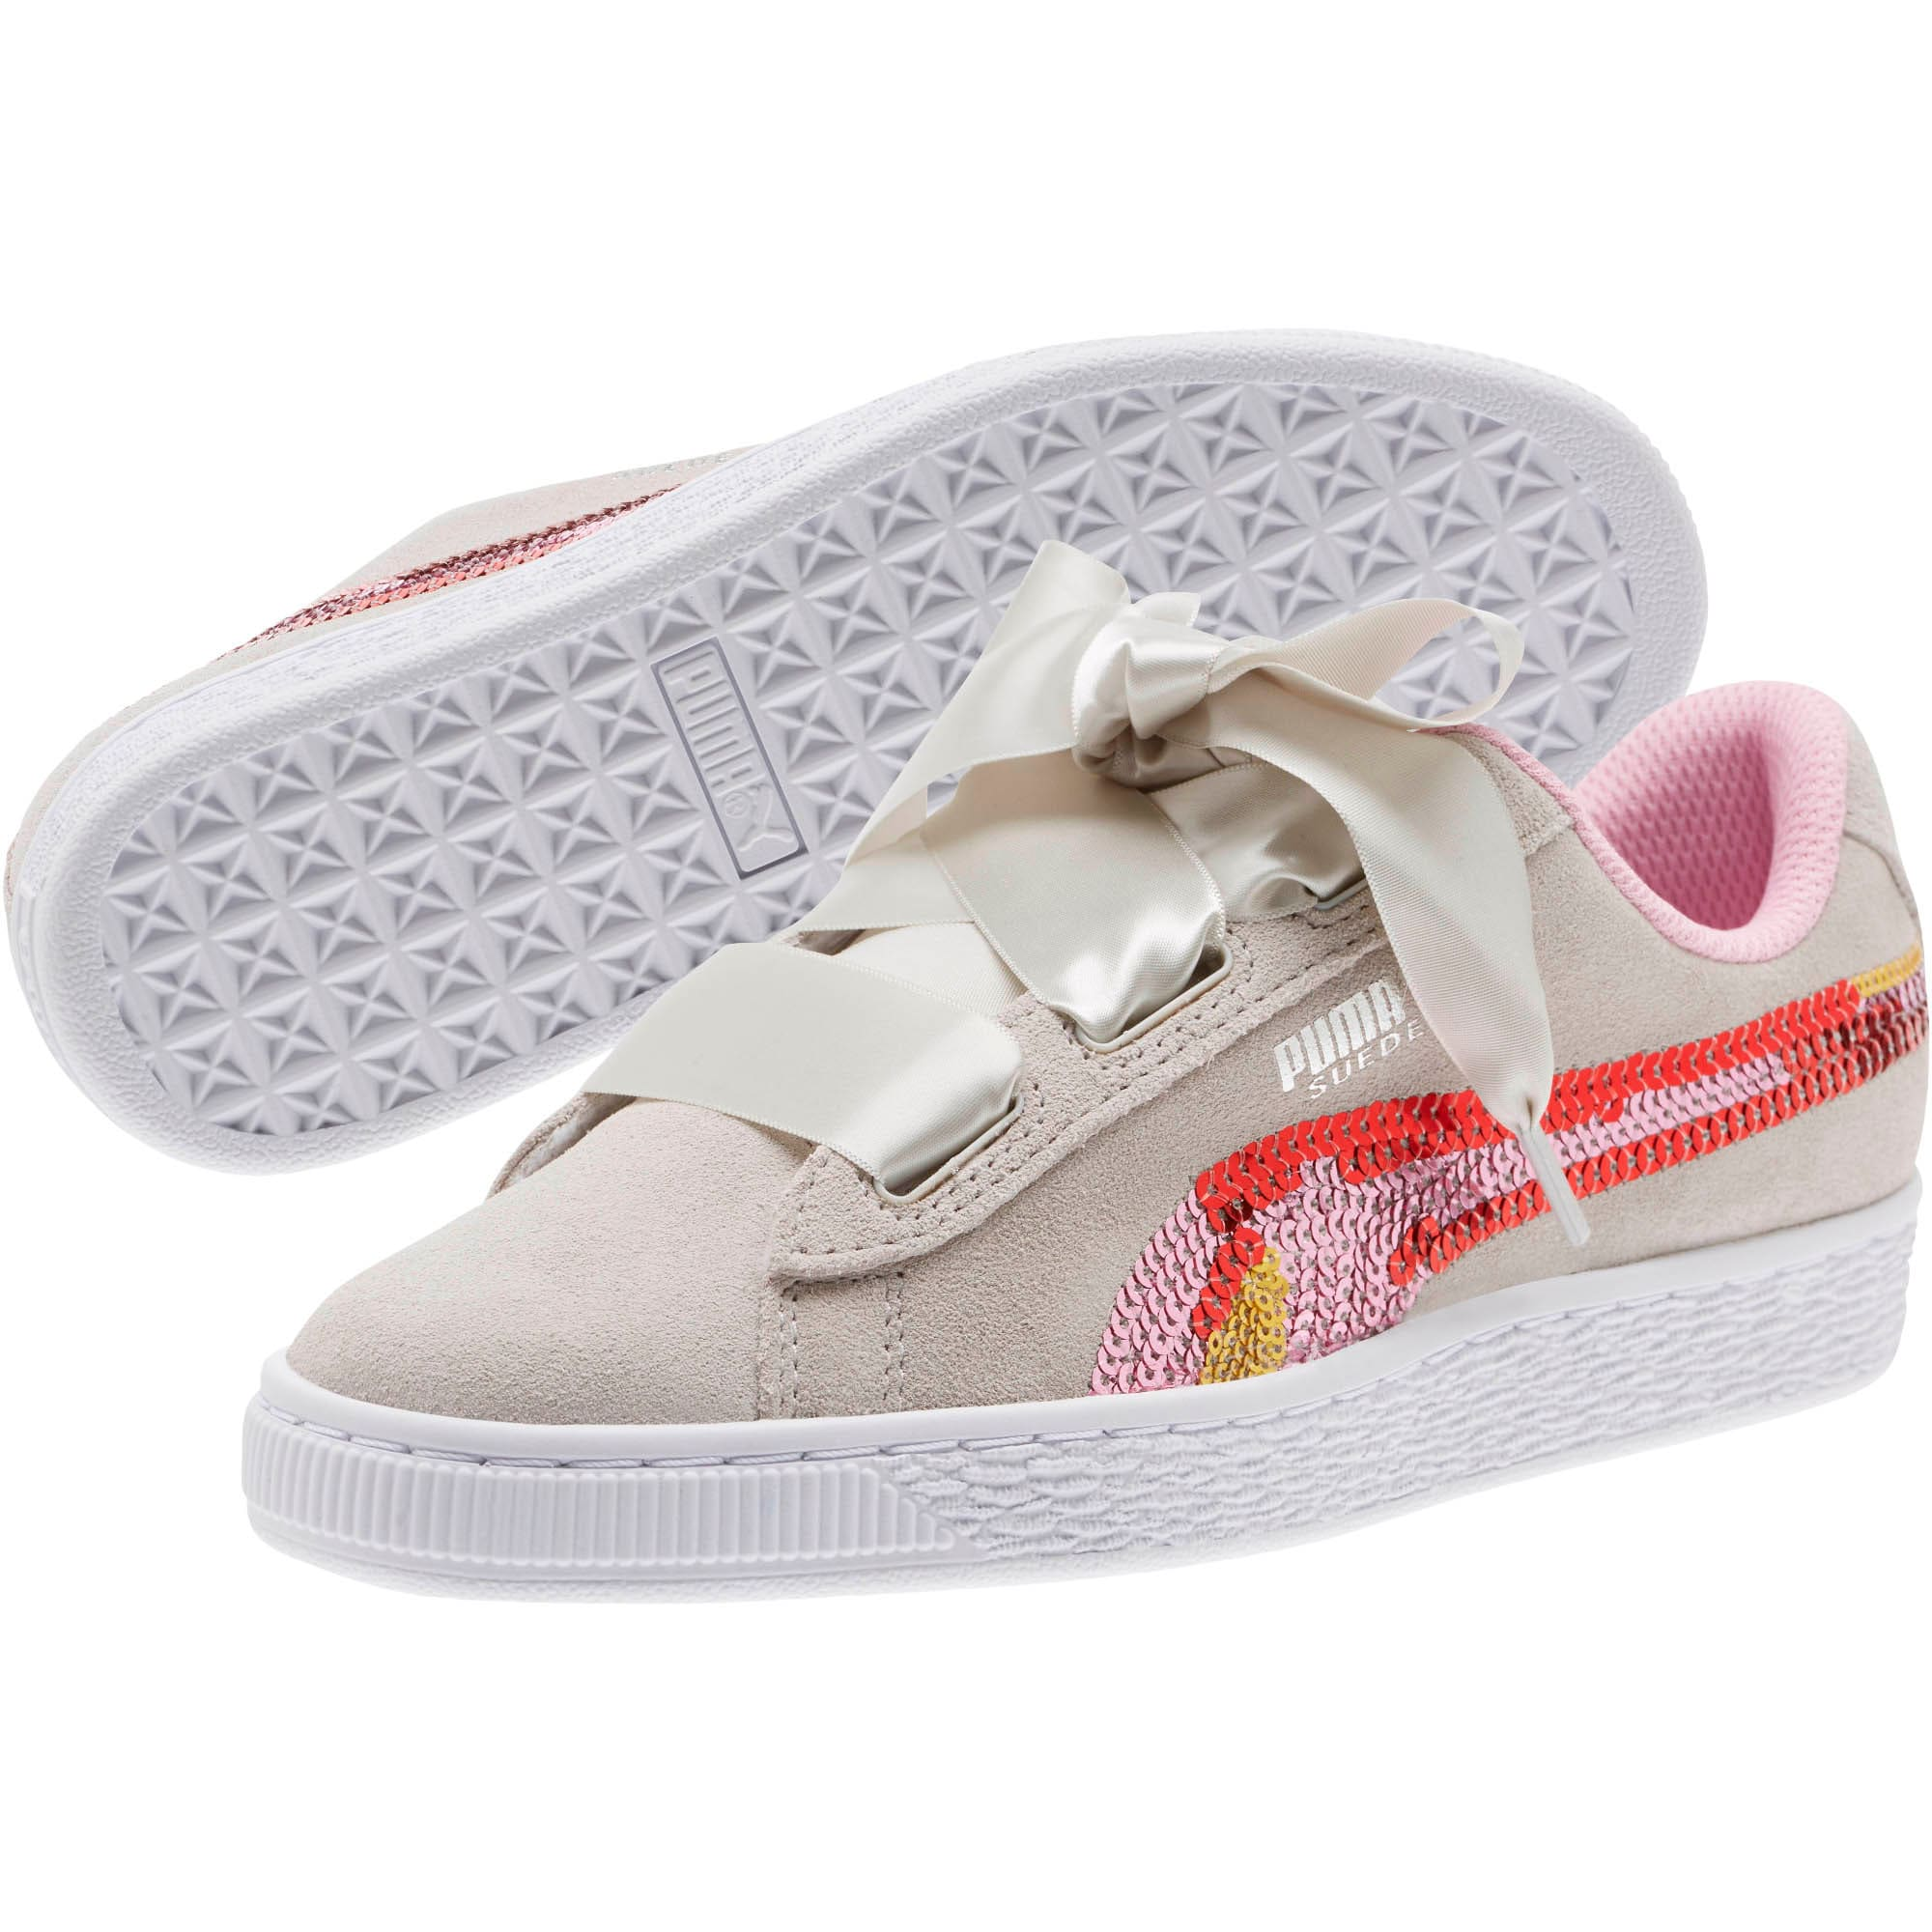 Thumbnail 2 of Suede Heart Trailblazer Sequin Sneakers JR, Gray Violet-Pale Pink, medium